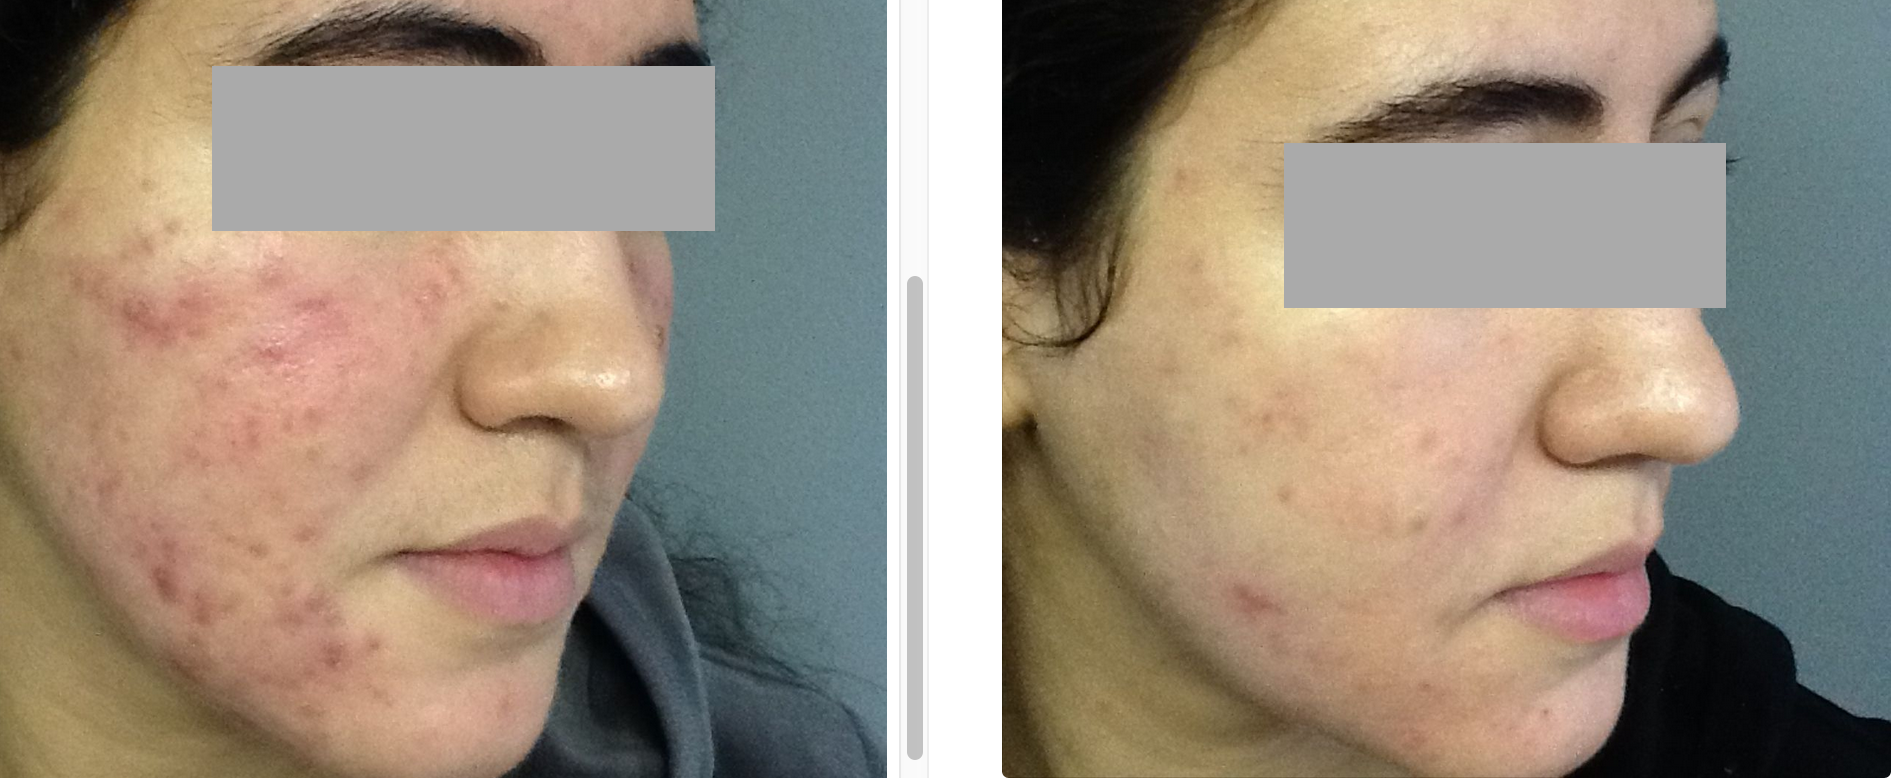 BAS Intensive Acne Treatment 8-weeks